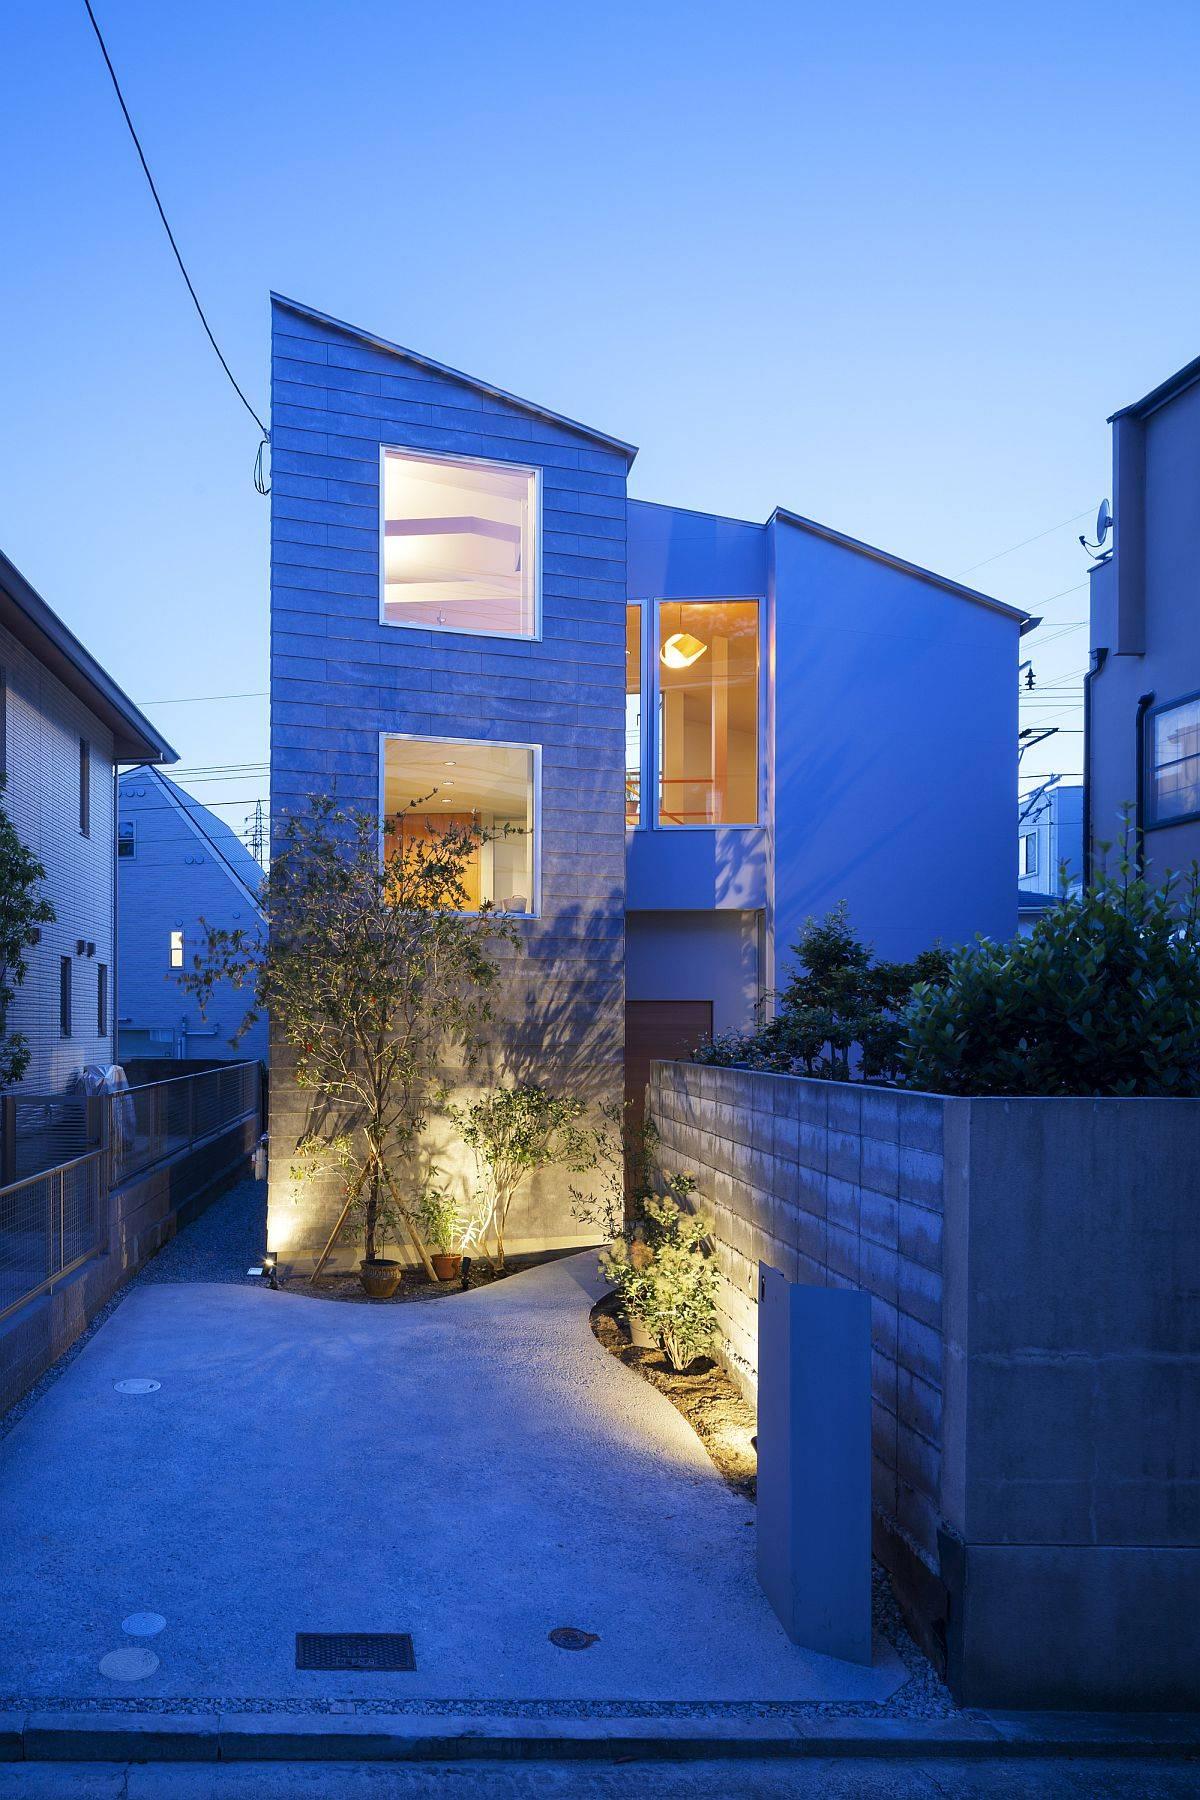 Beautifully-illuminated-entry-of-the-modern-Japanese-home-23840